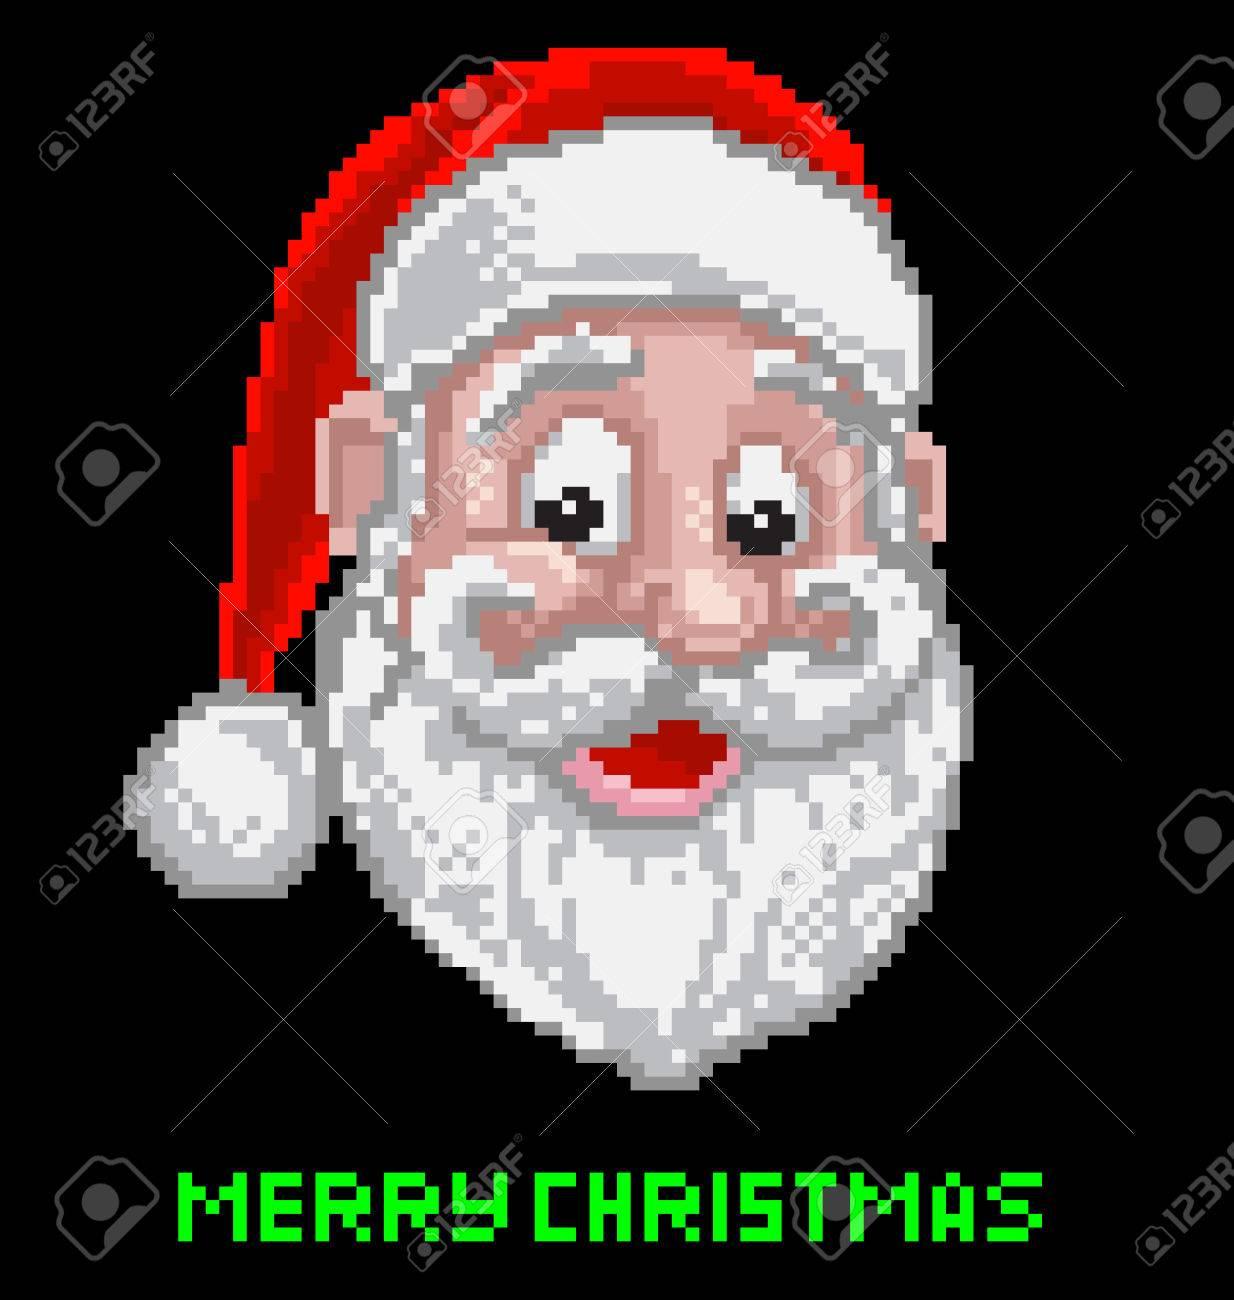 Santa Claus Christmas Pixel Art dedans Pixel Art Pere Noel